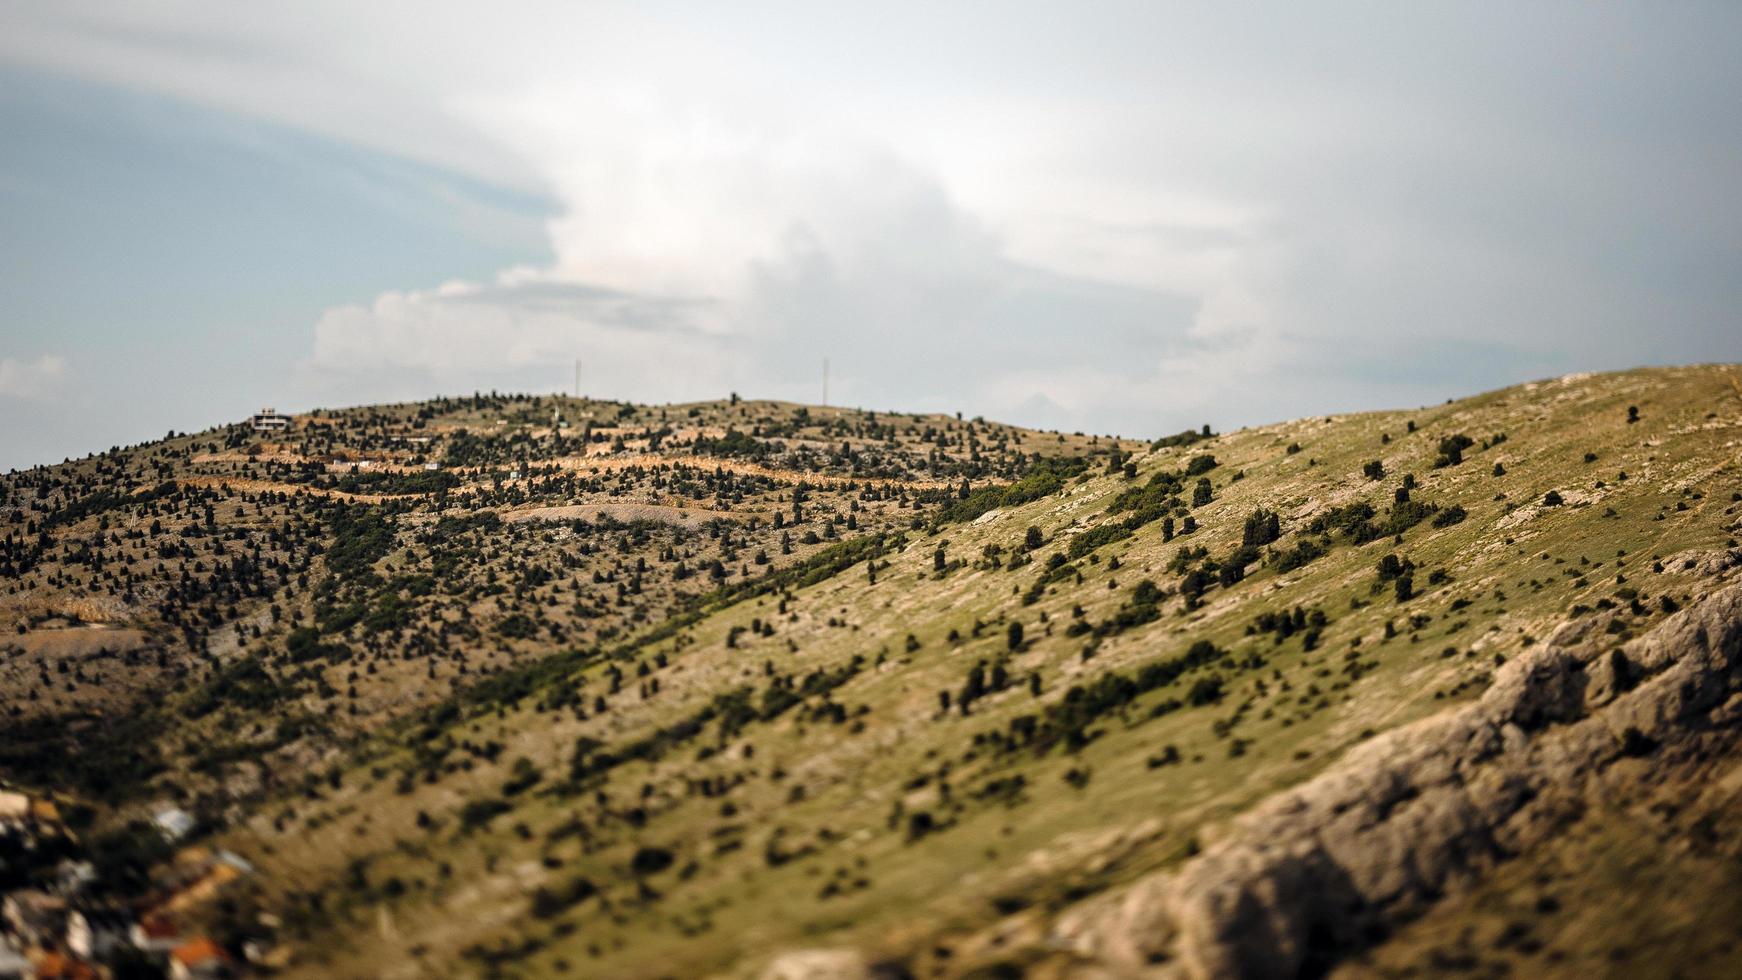 spostamento di inclinazione di una catena montuosa verde foto